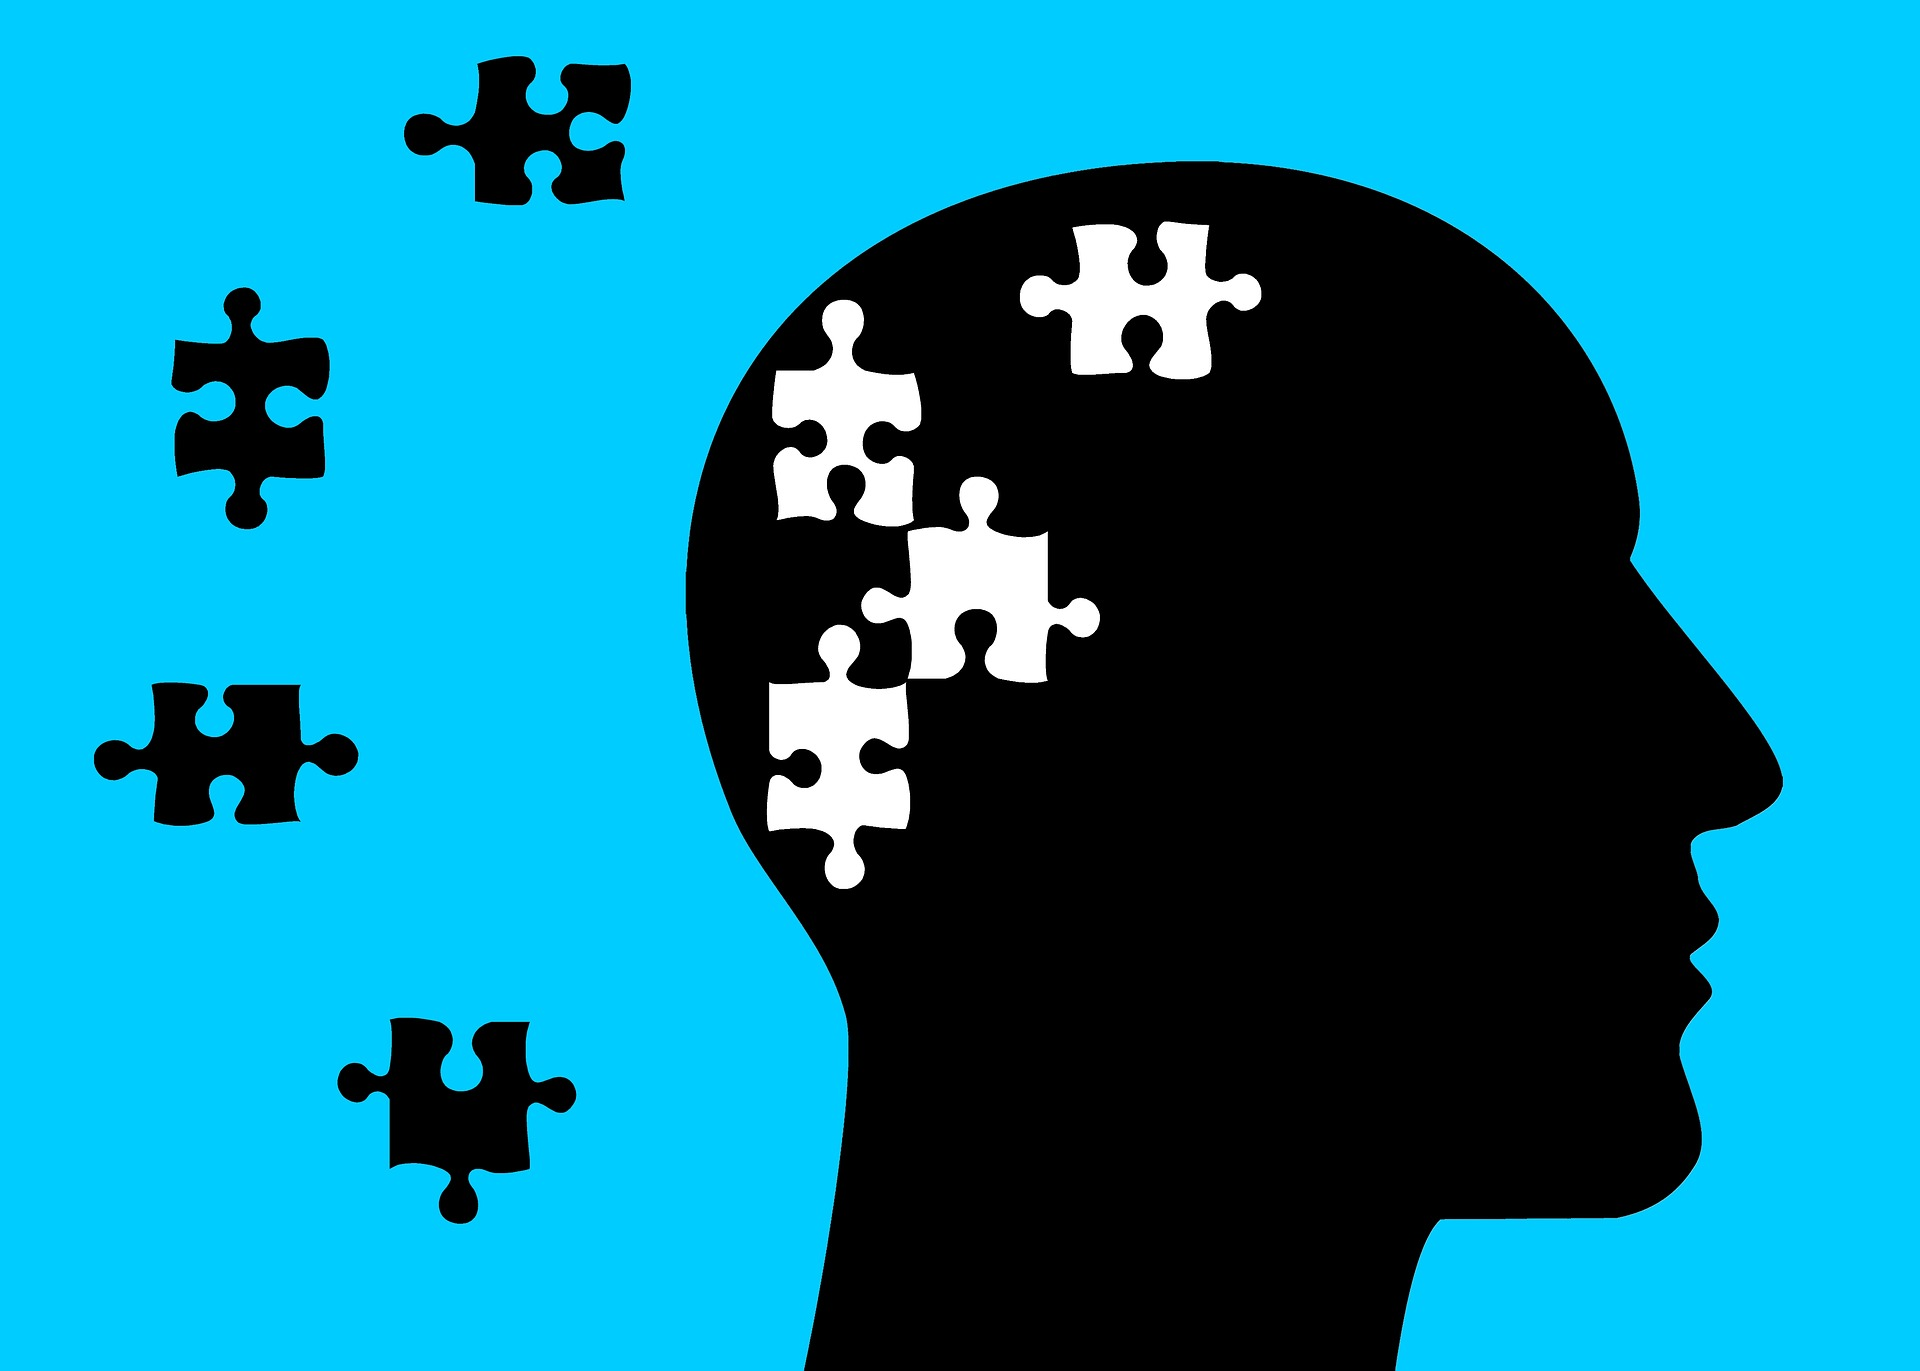 Dunhill Medical Trust-Alzheimer's Research UK Clinical Research Fellowship Now Open